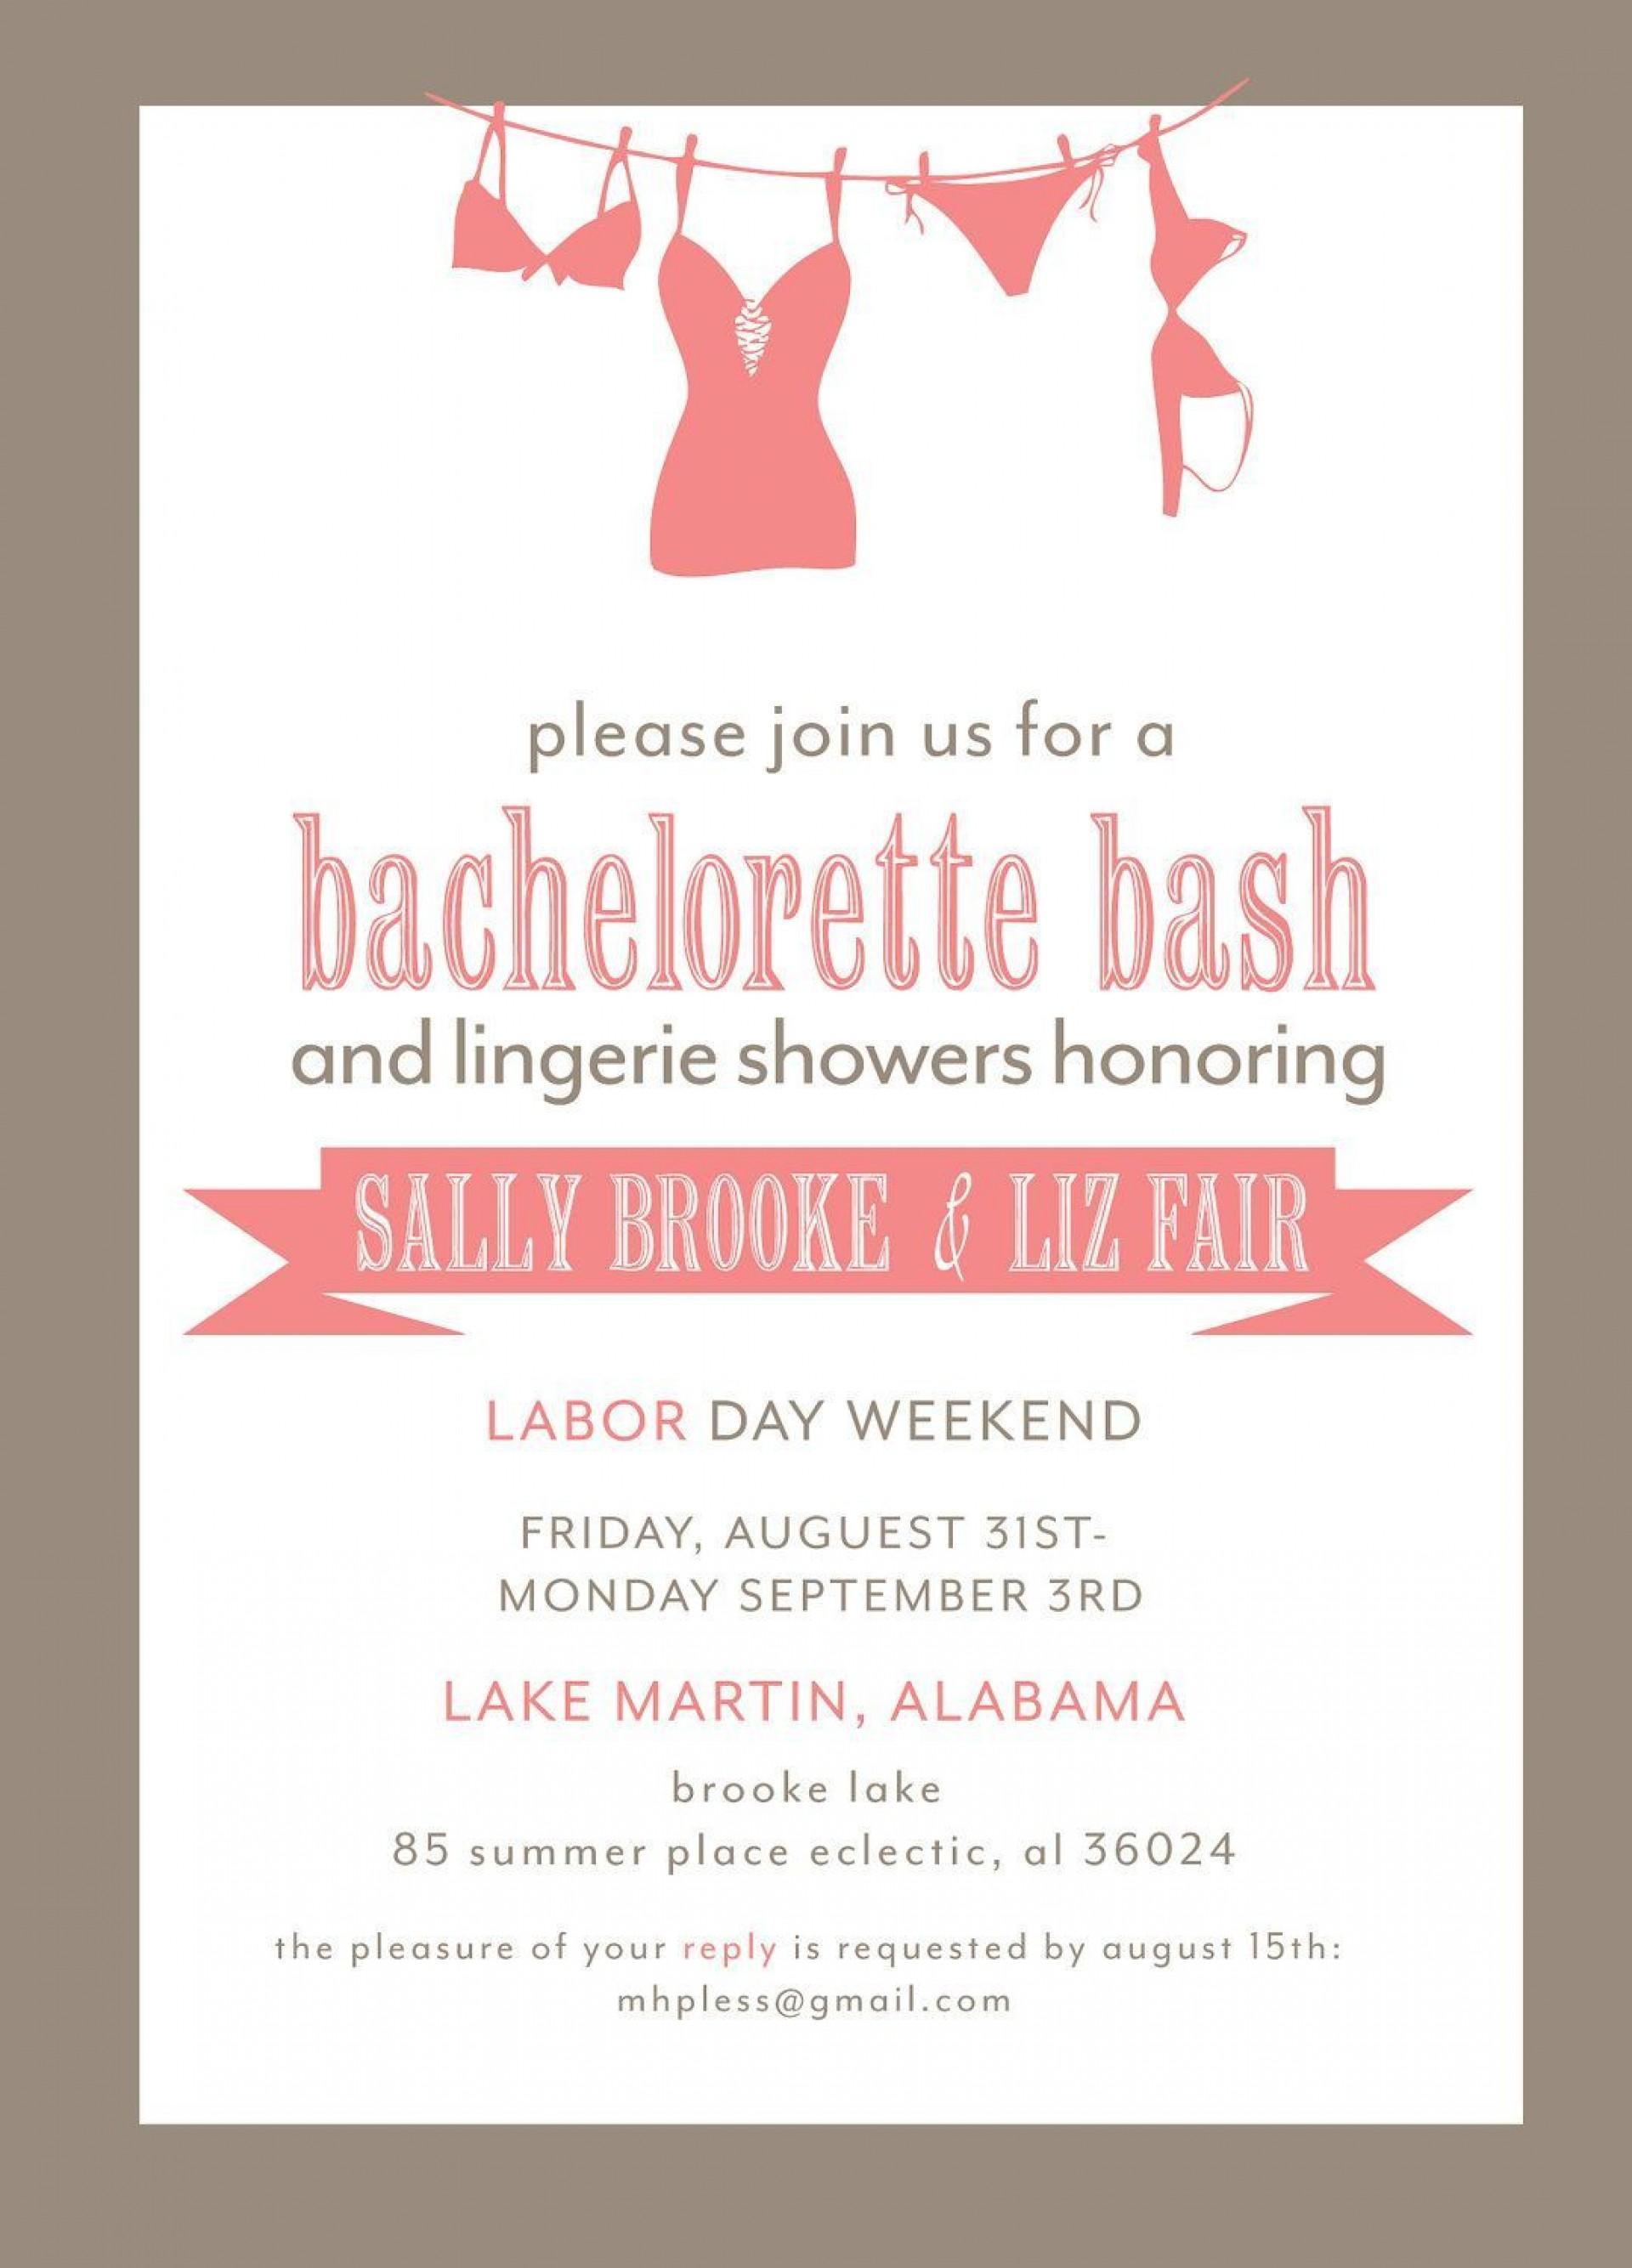 001 Wondrou Bachelorette Party Invitation Template Word Free Idea 1920